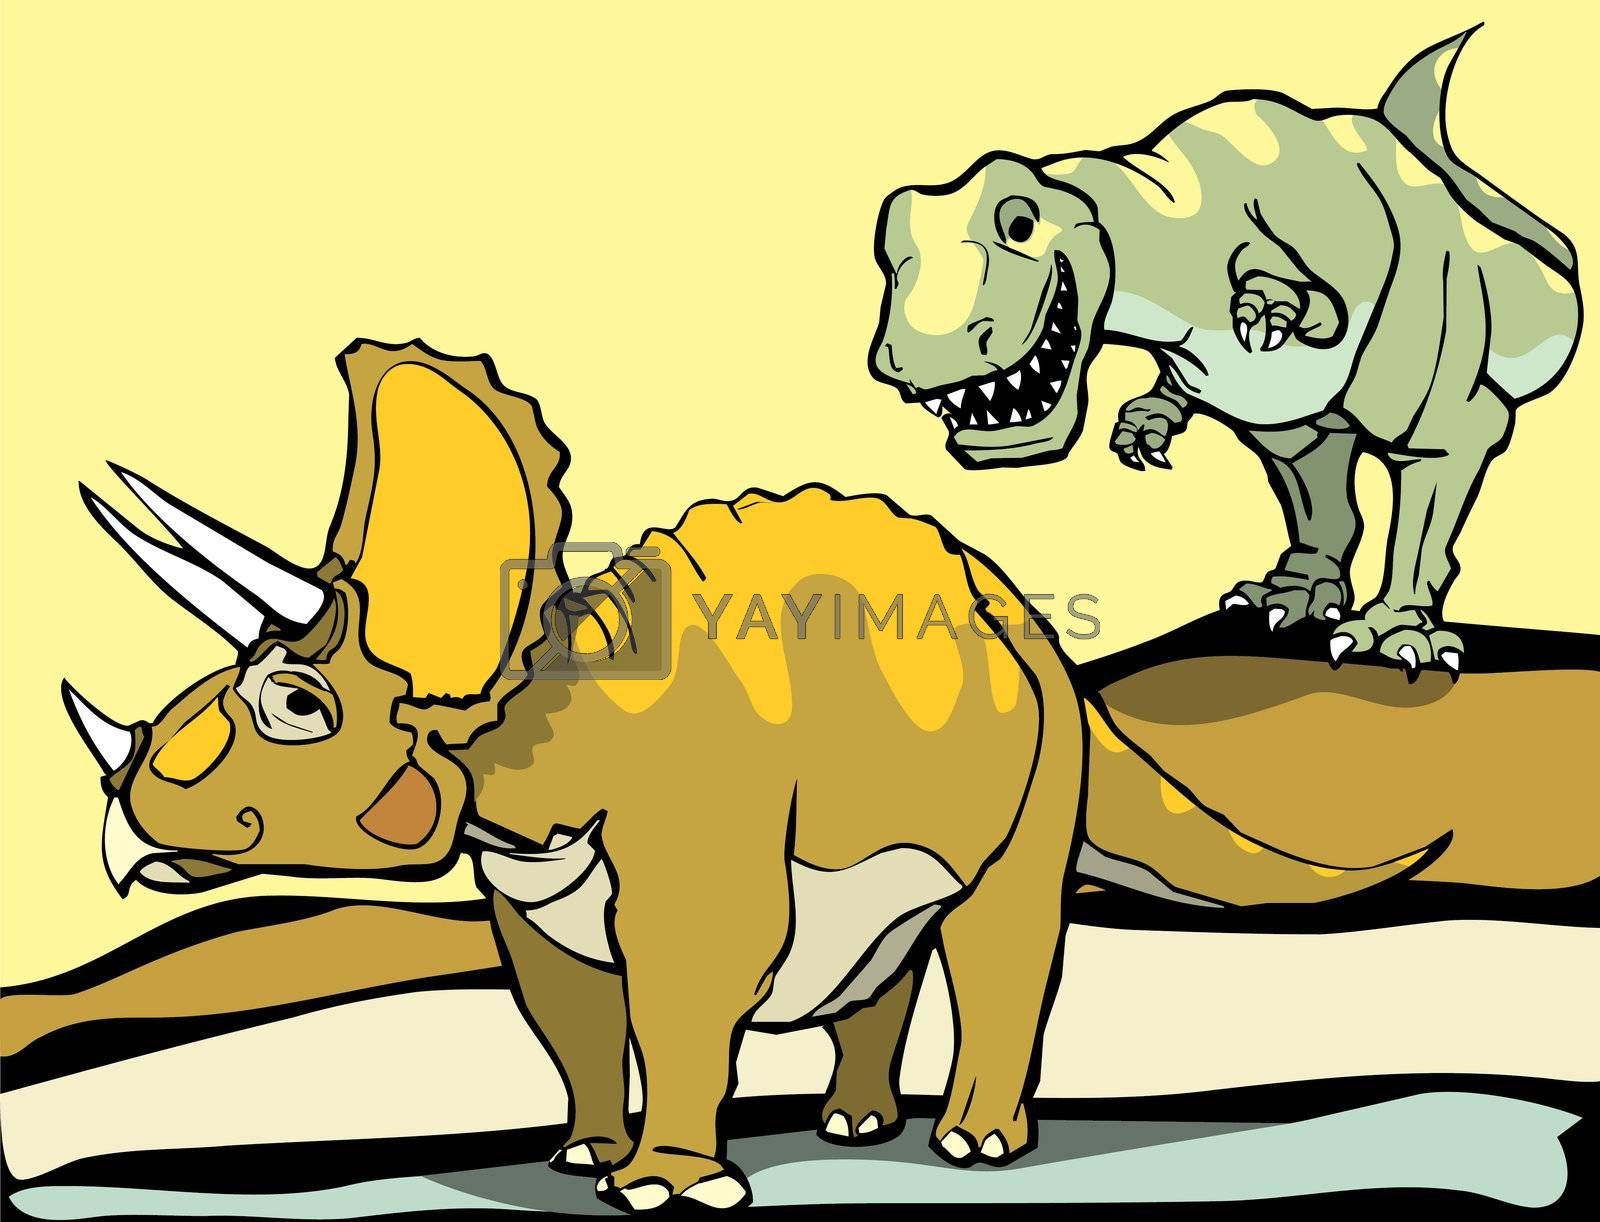 Smiling Tyrannosaurus Rex hunts the Triceratops.